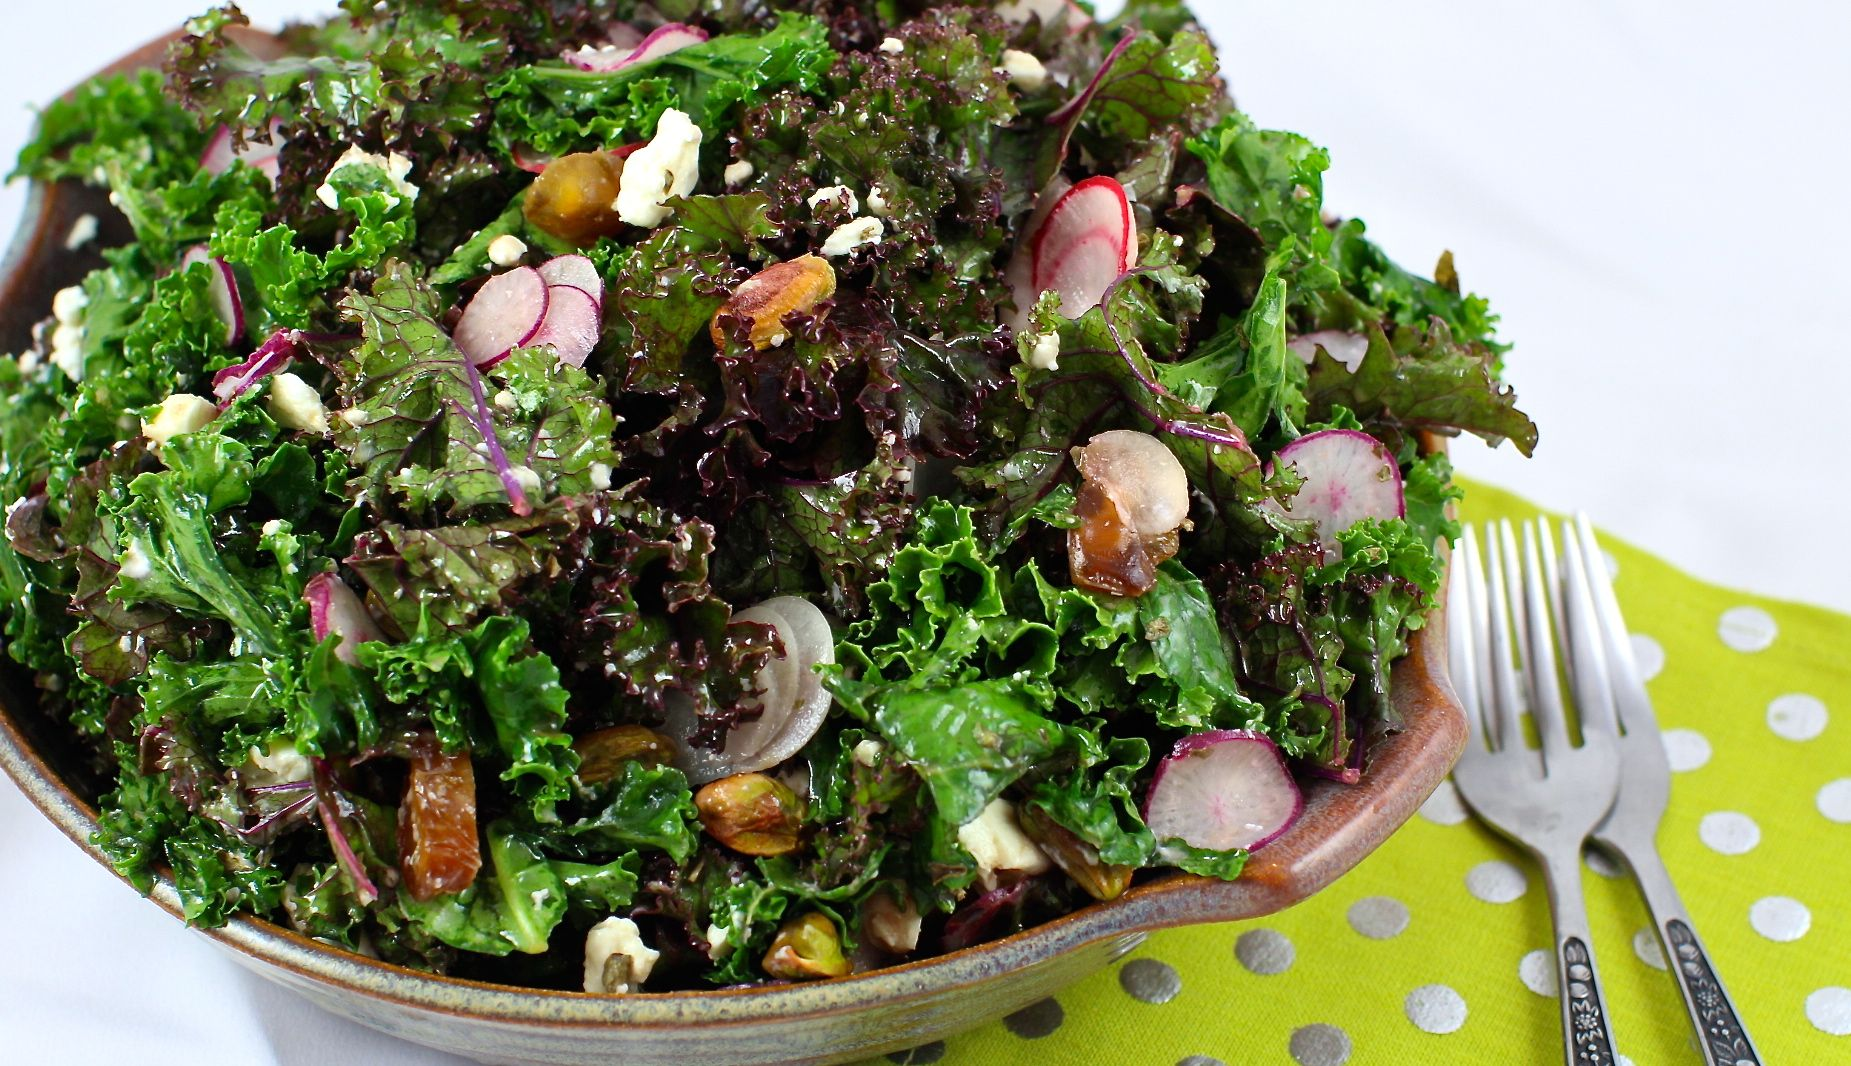 Lemon Vinaigrette Kale Salad with Macadamia Feta #raw